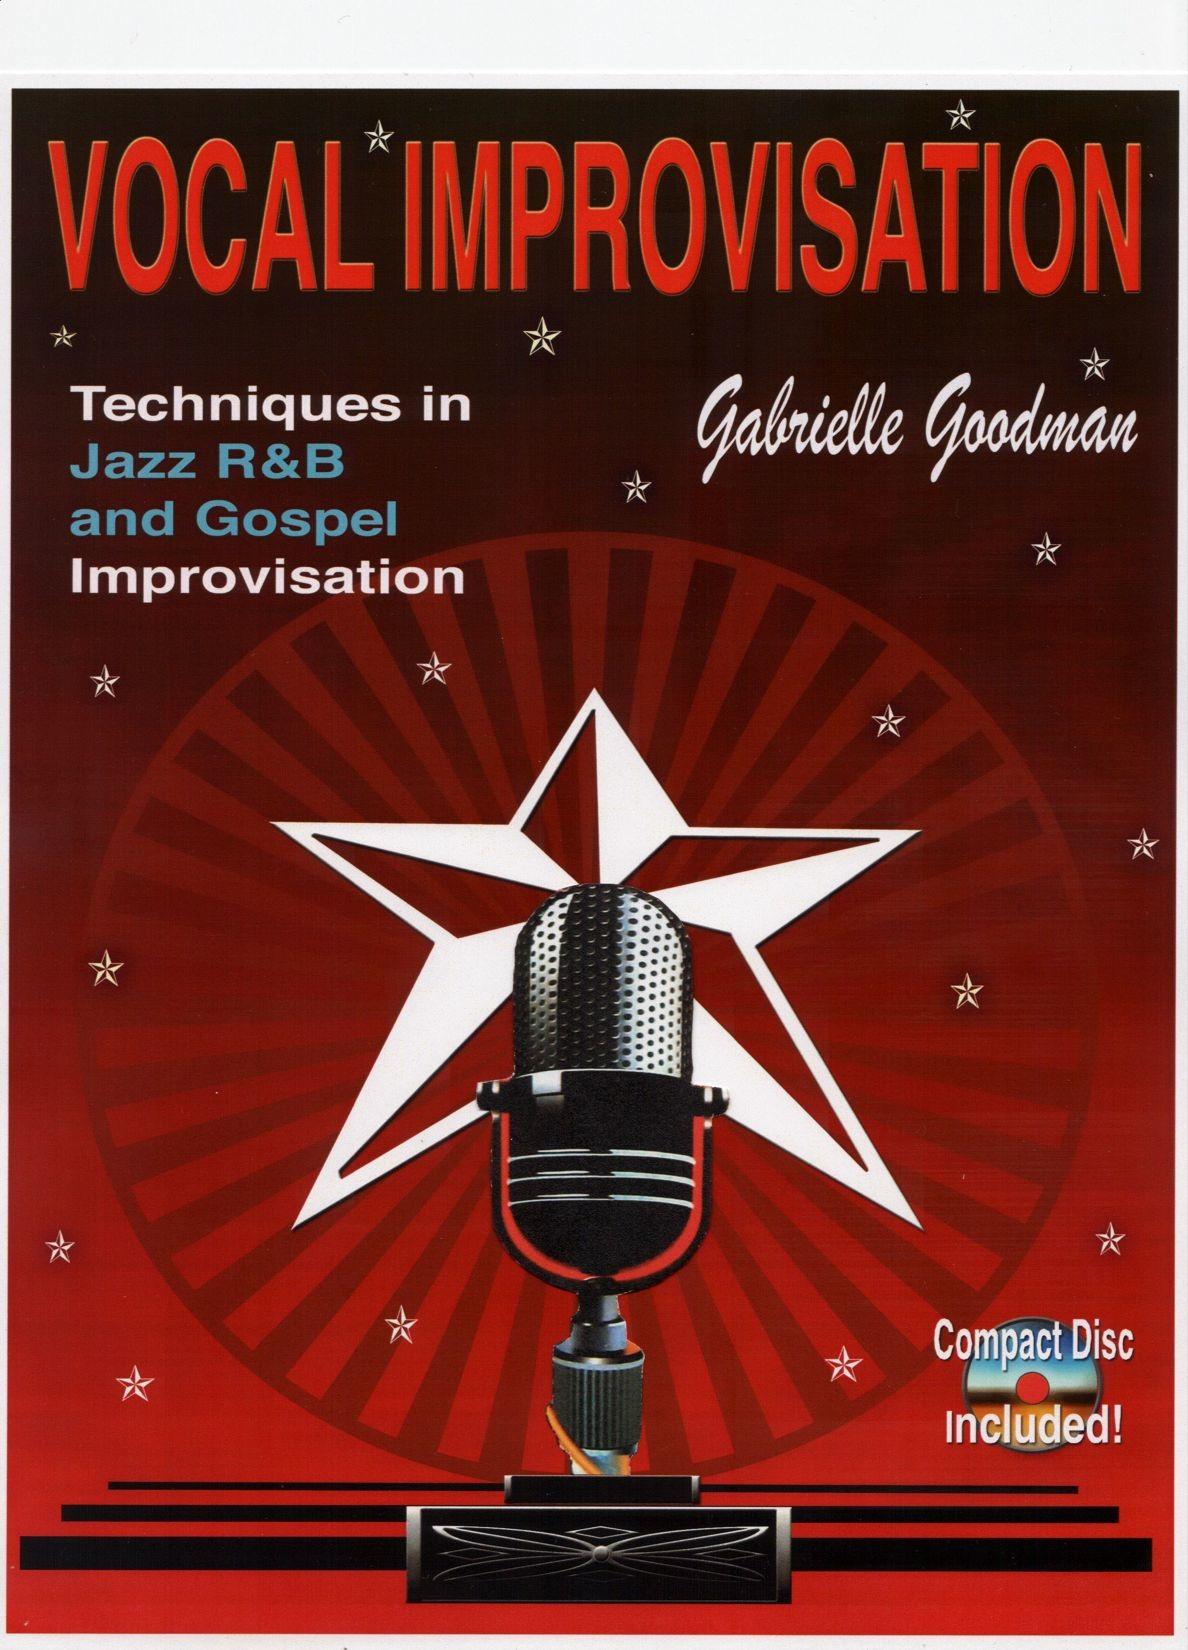 Cover of Gabrielle Goodman Improvisation book